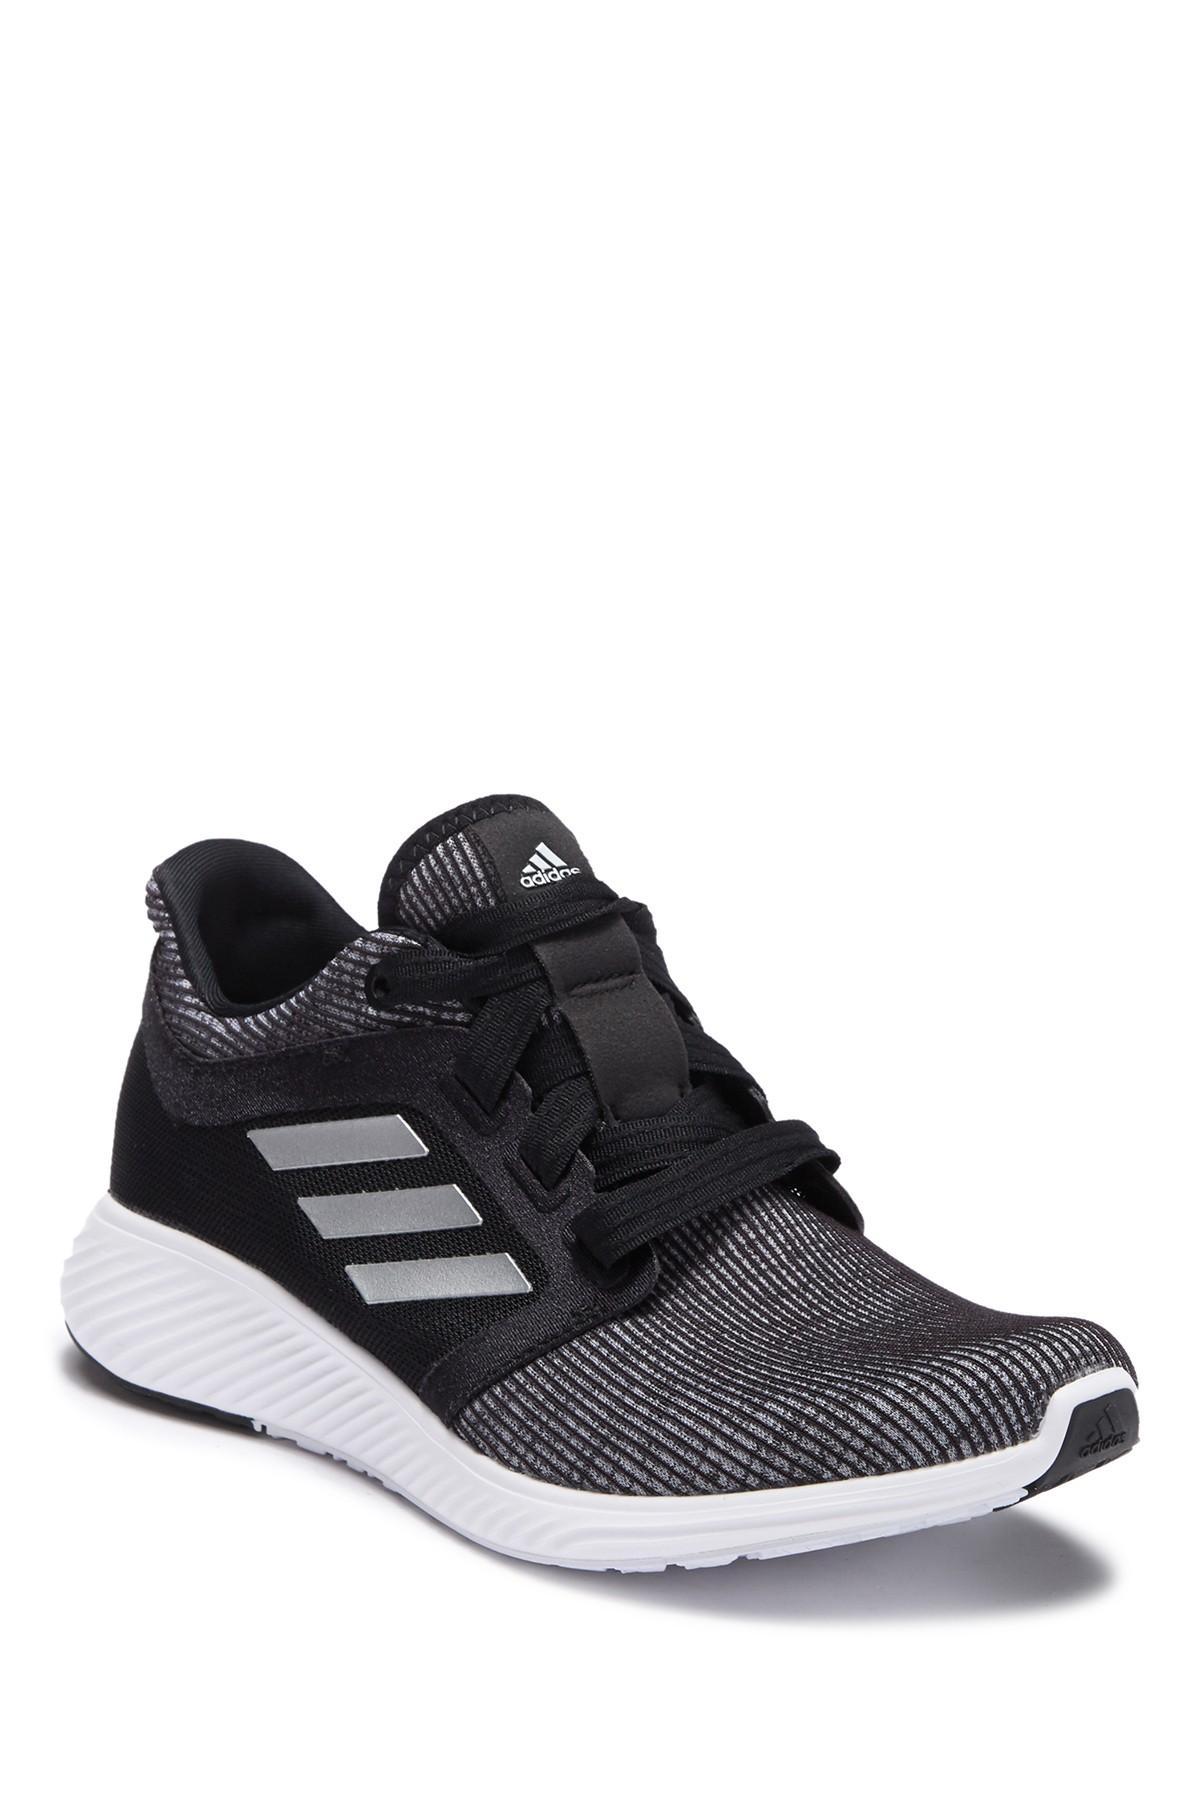 7784290b20c adidas. Women s Black Edge Lux Sneaker.  85  66 From Nordstrom Rack